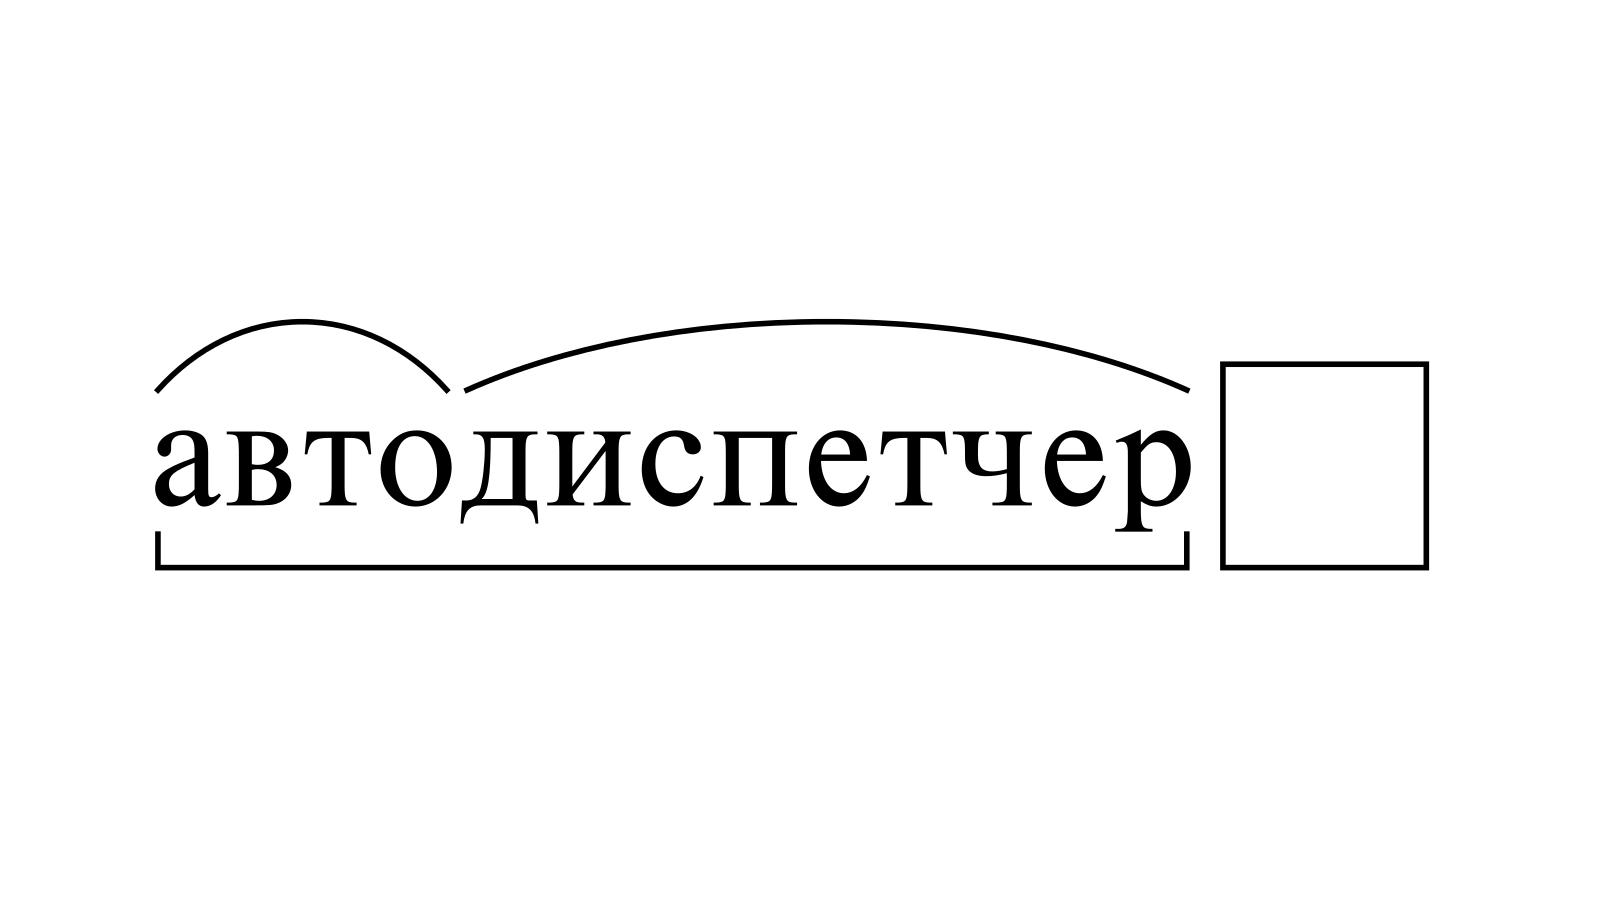 Разбор слова «автодиспетчер» по составу